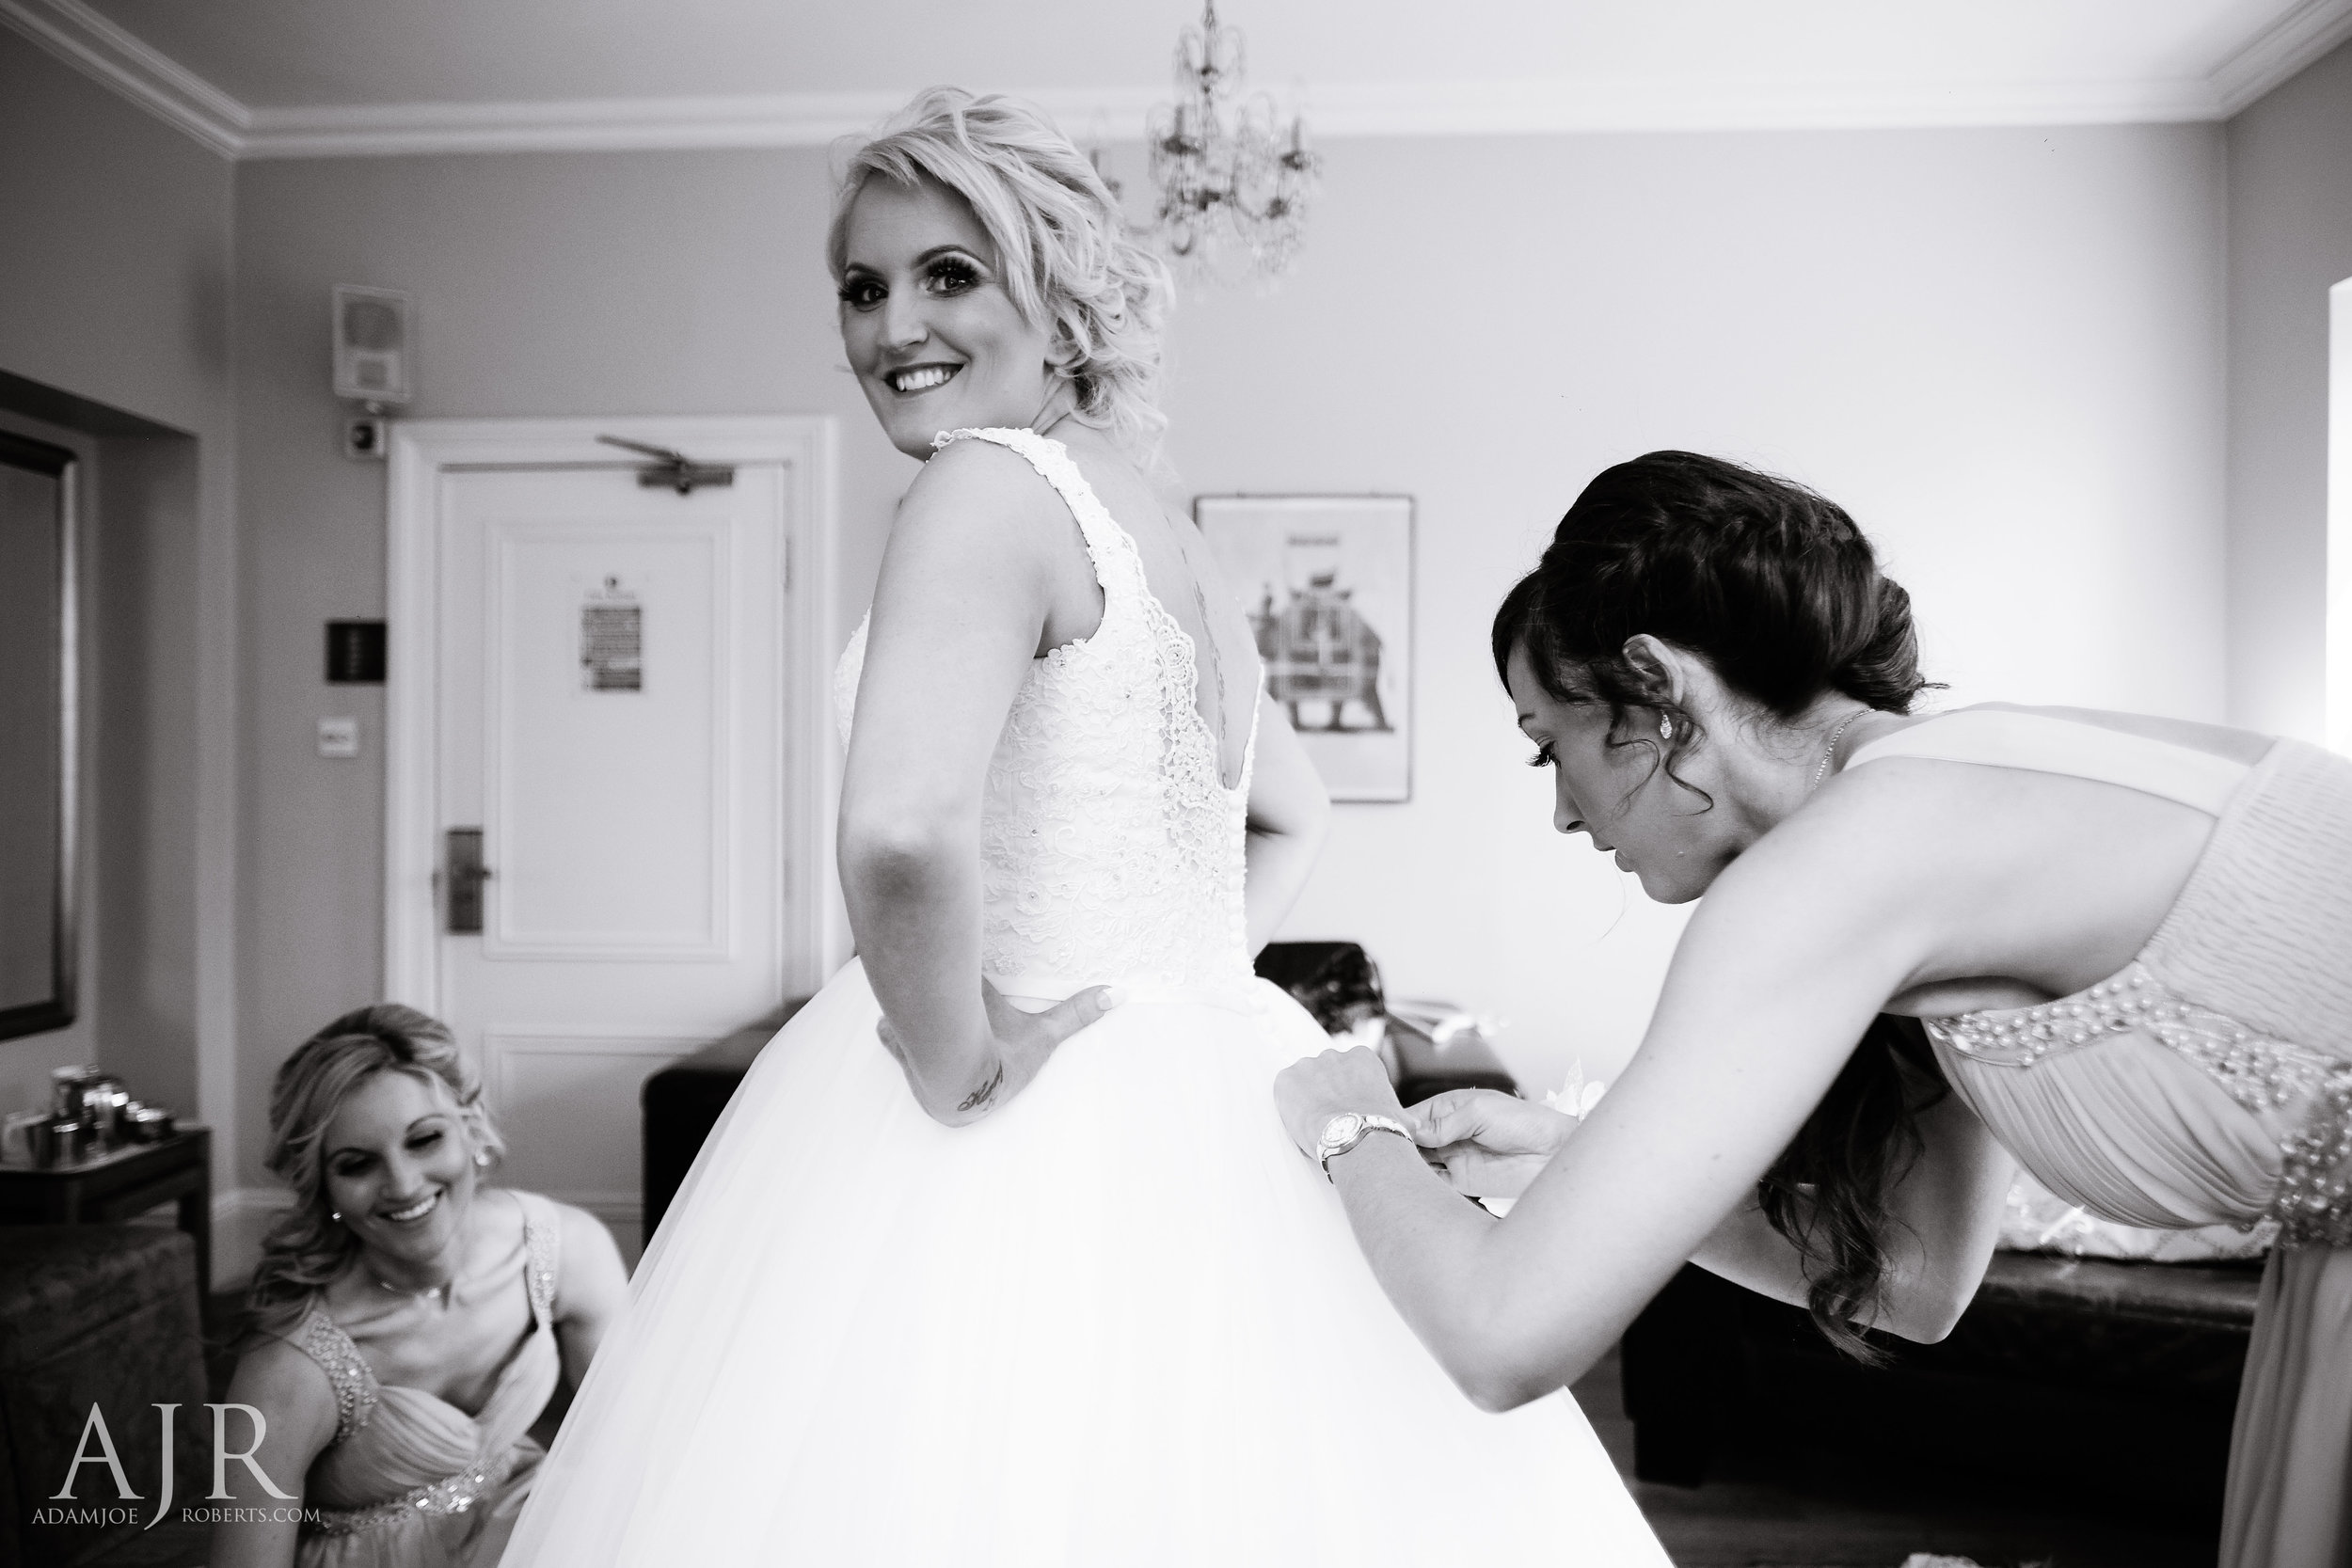 statham lodge wedding photographer cheshire wedding photographer (4 of 11).jpg